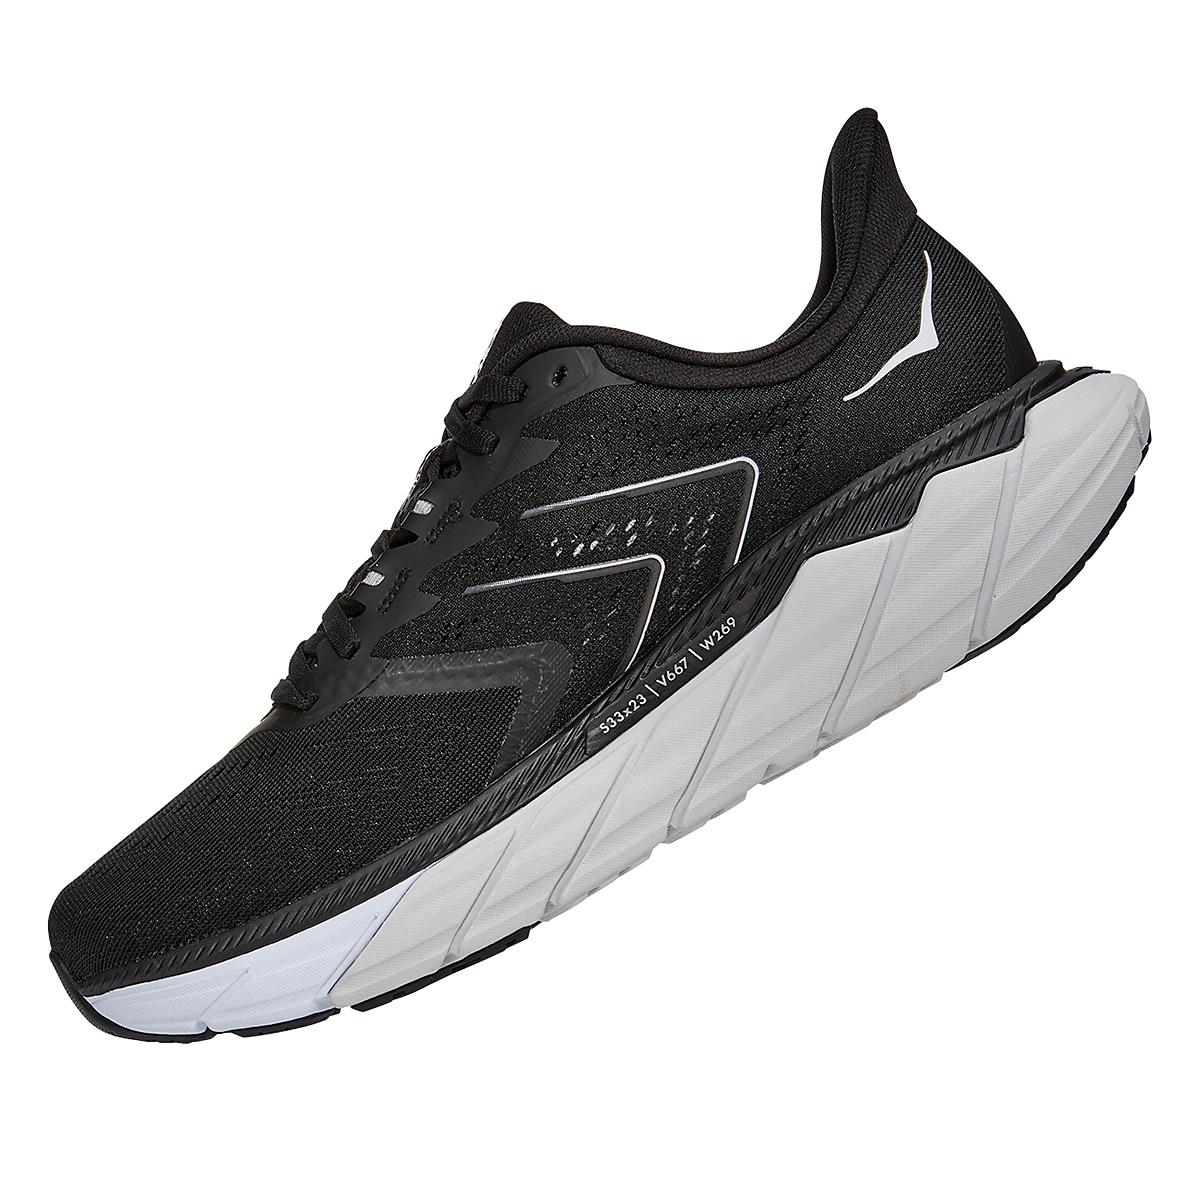 Men's Hoka One One Arahi 5 Running Shoe - Color: Black/White - Size: 7 - Width: Regular, Black/White, large, image 4